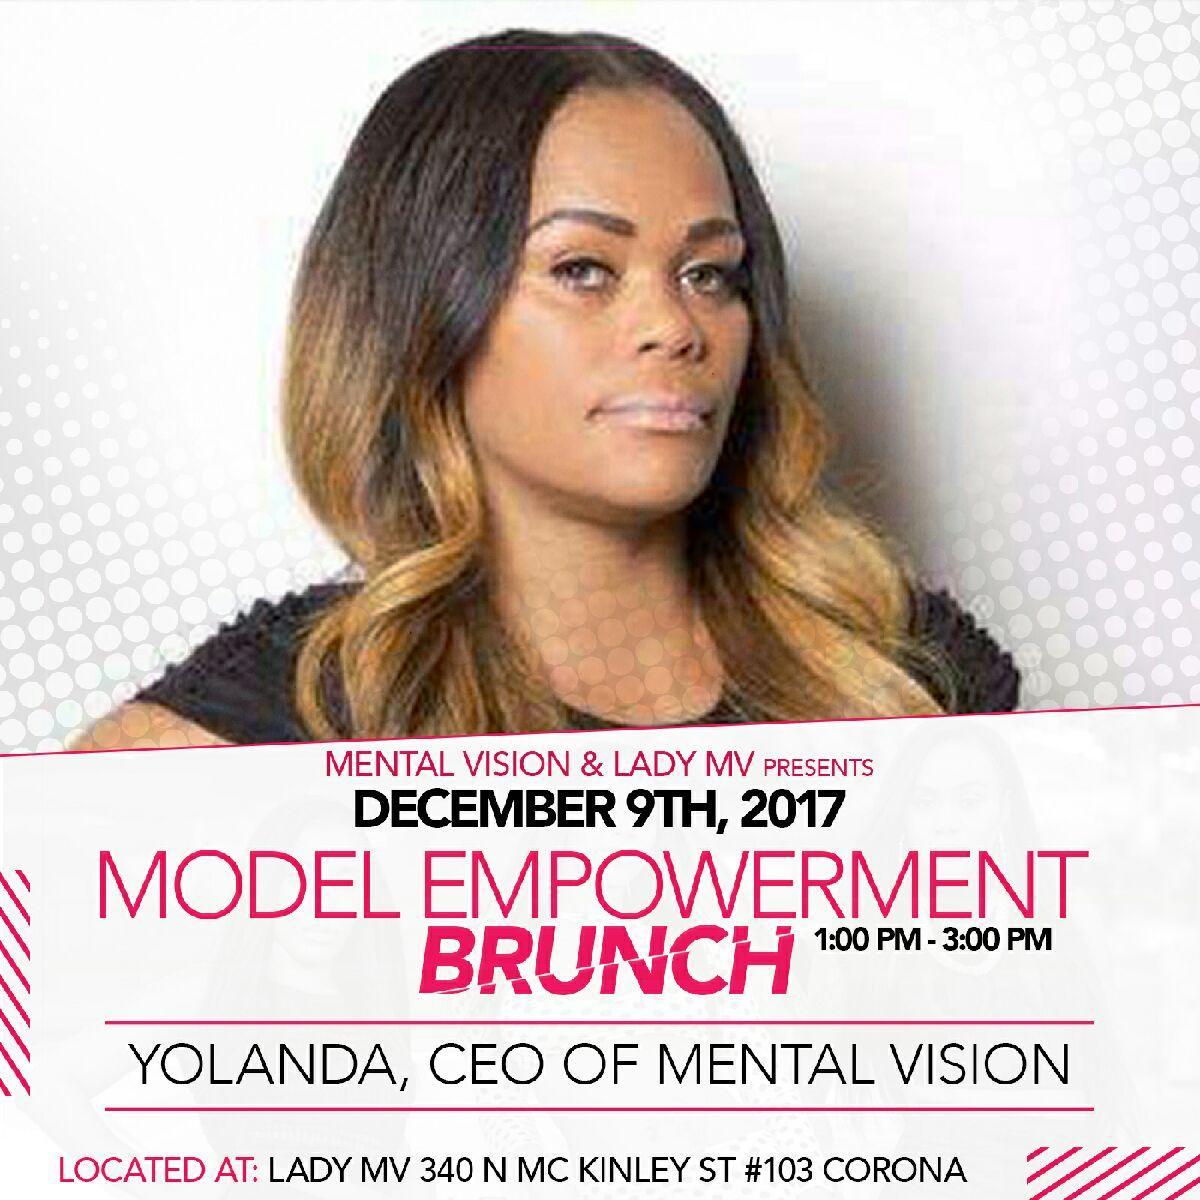 Model Empowerment Brunch - Lady MV - Panelist